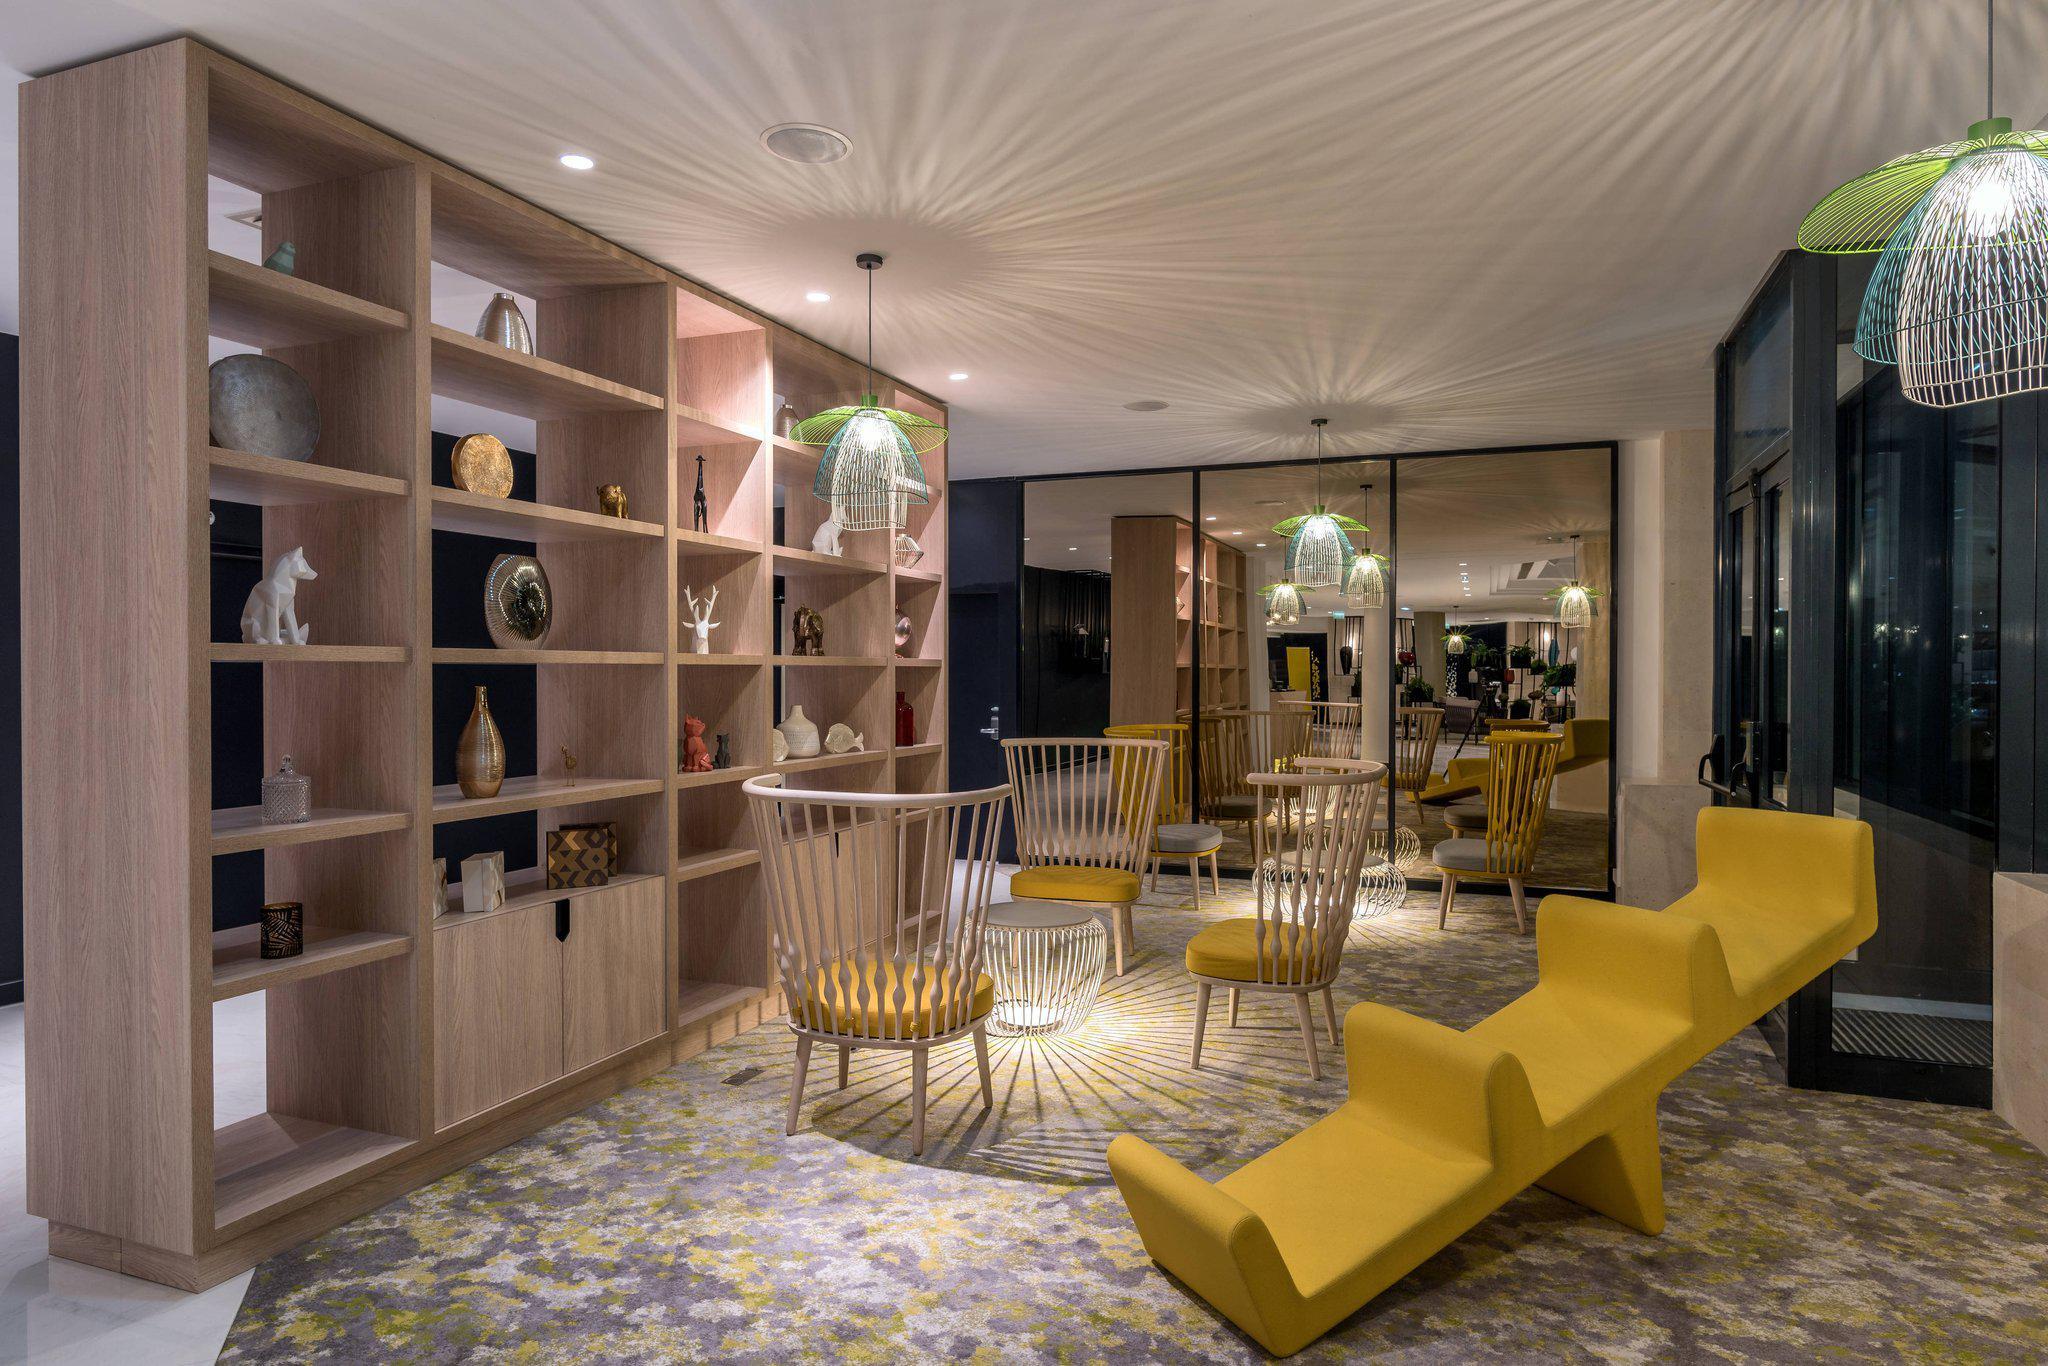 Courtyard by Marriott Paris Roissy Charles de Gaulle Airport Hotel